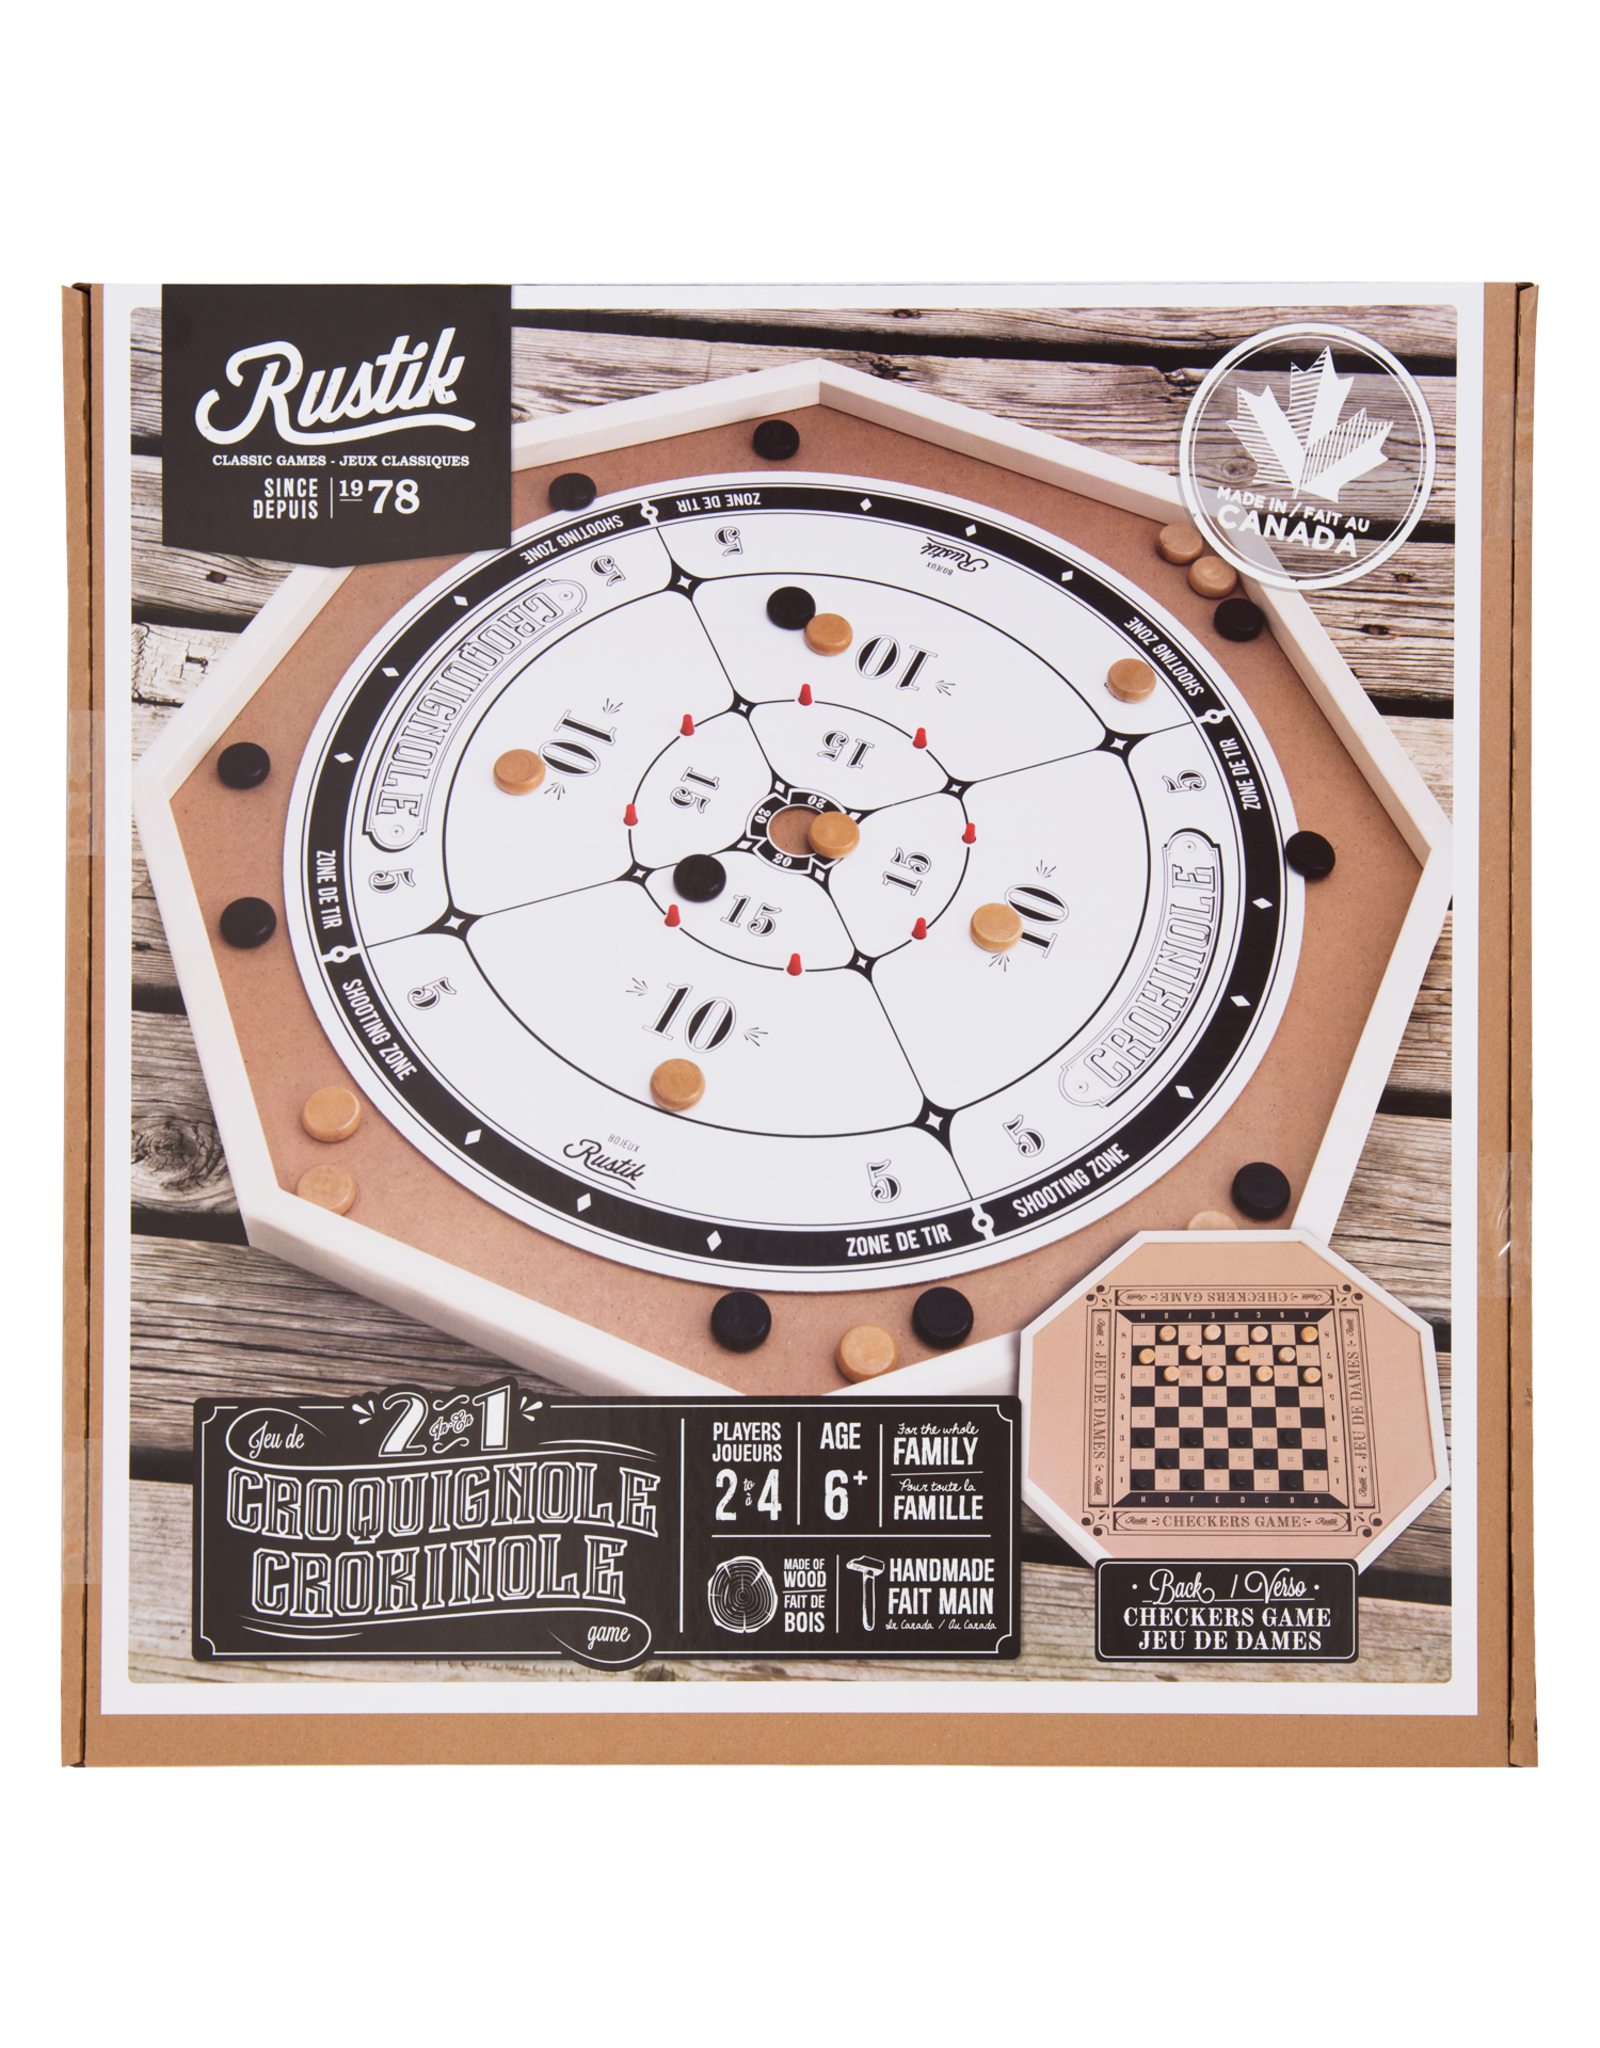 Rustik Crokinole Board 2 Games in 1